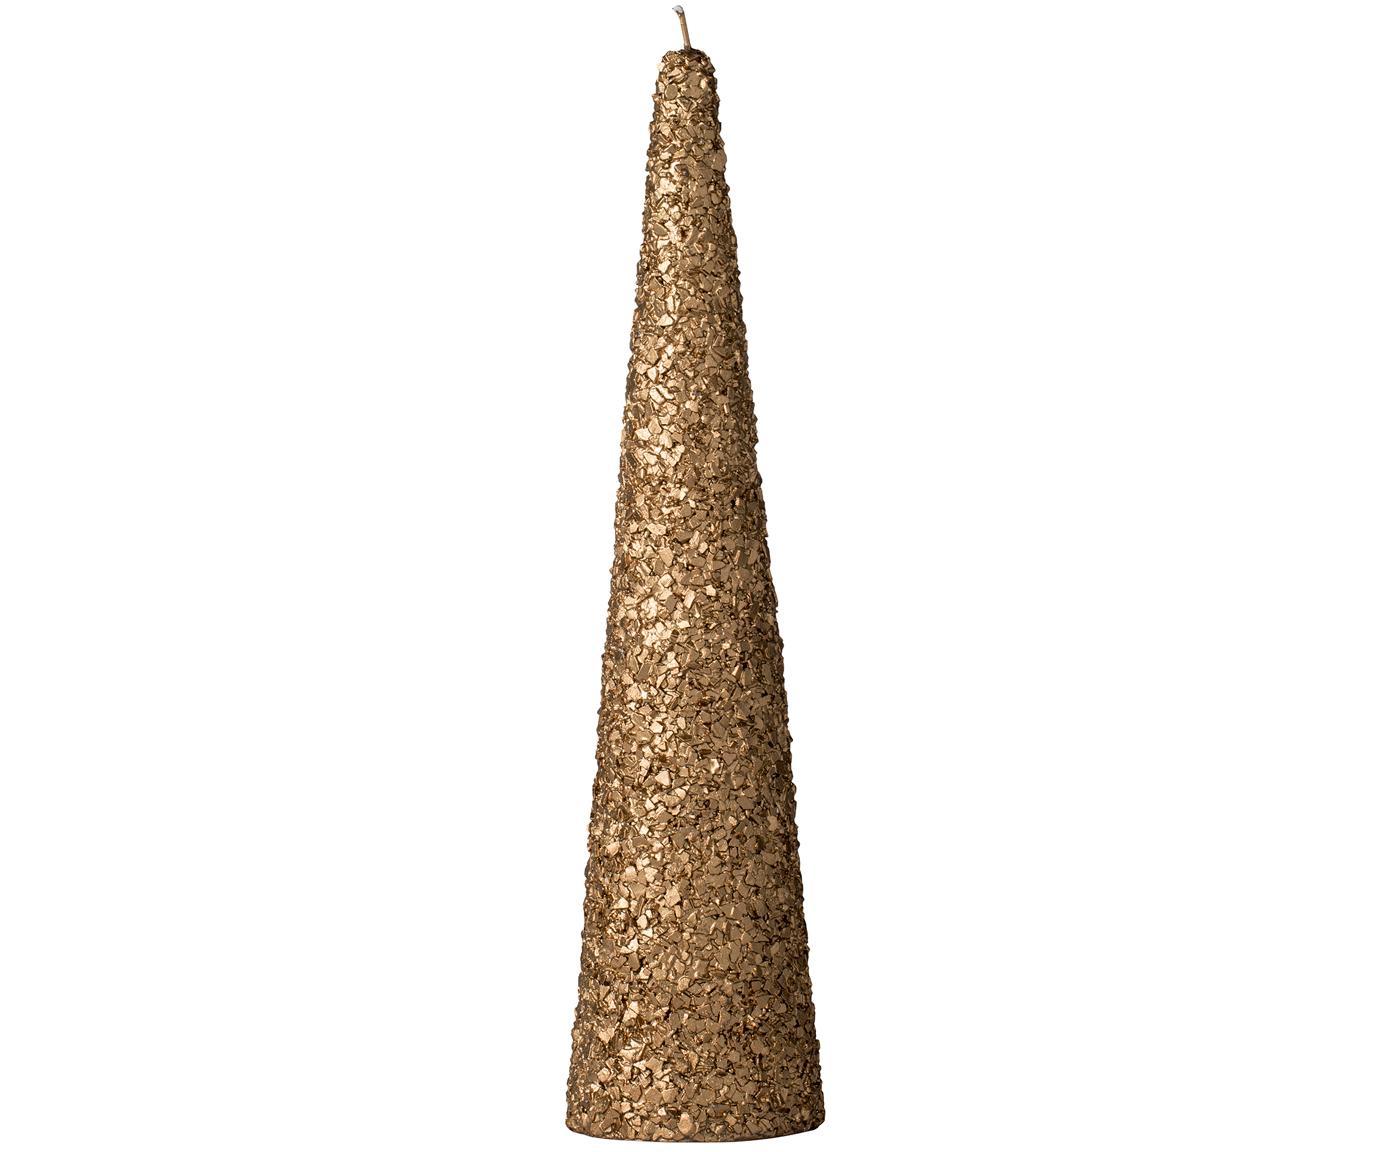 Candela deco Gliteria, 95% cera paraffinica, 5% cera di soia, Marrone, Ø 7 x A 30 cm